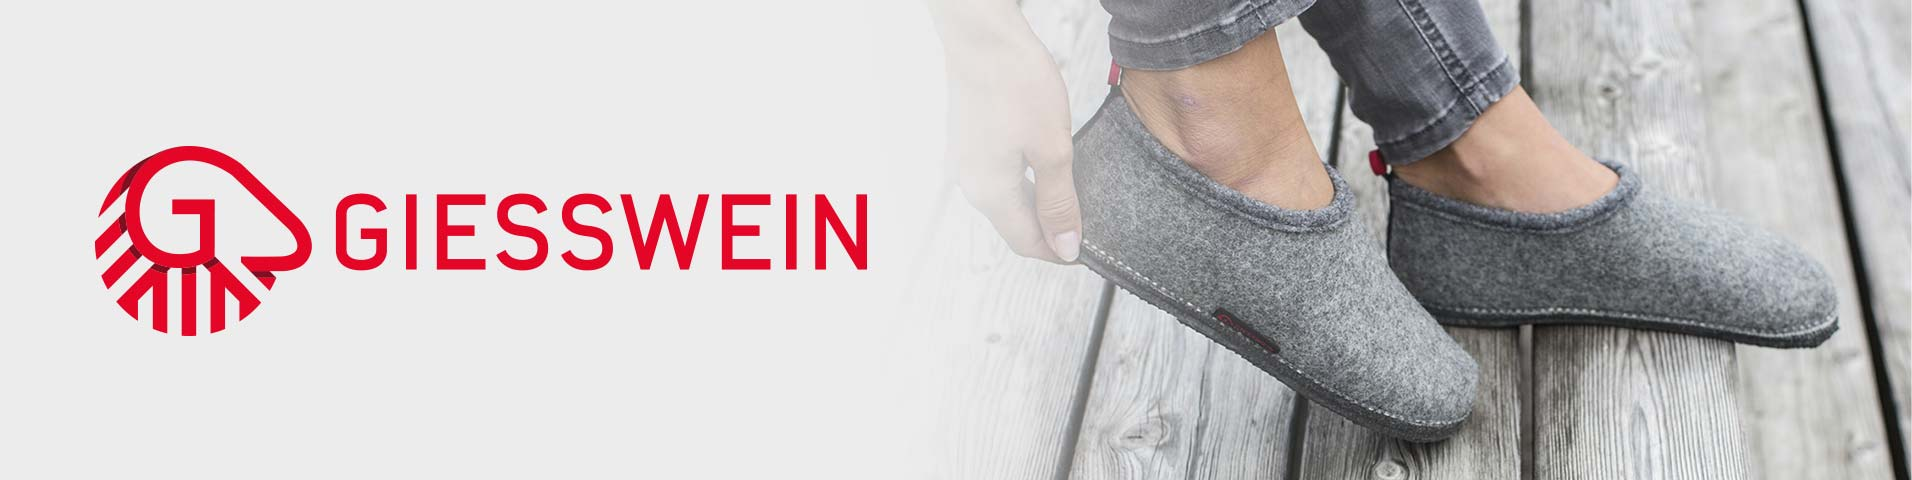 fc98c355efc Giesswein online shop | Gratis verzending | ZALANDO